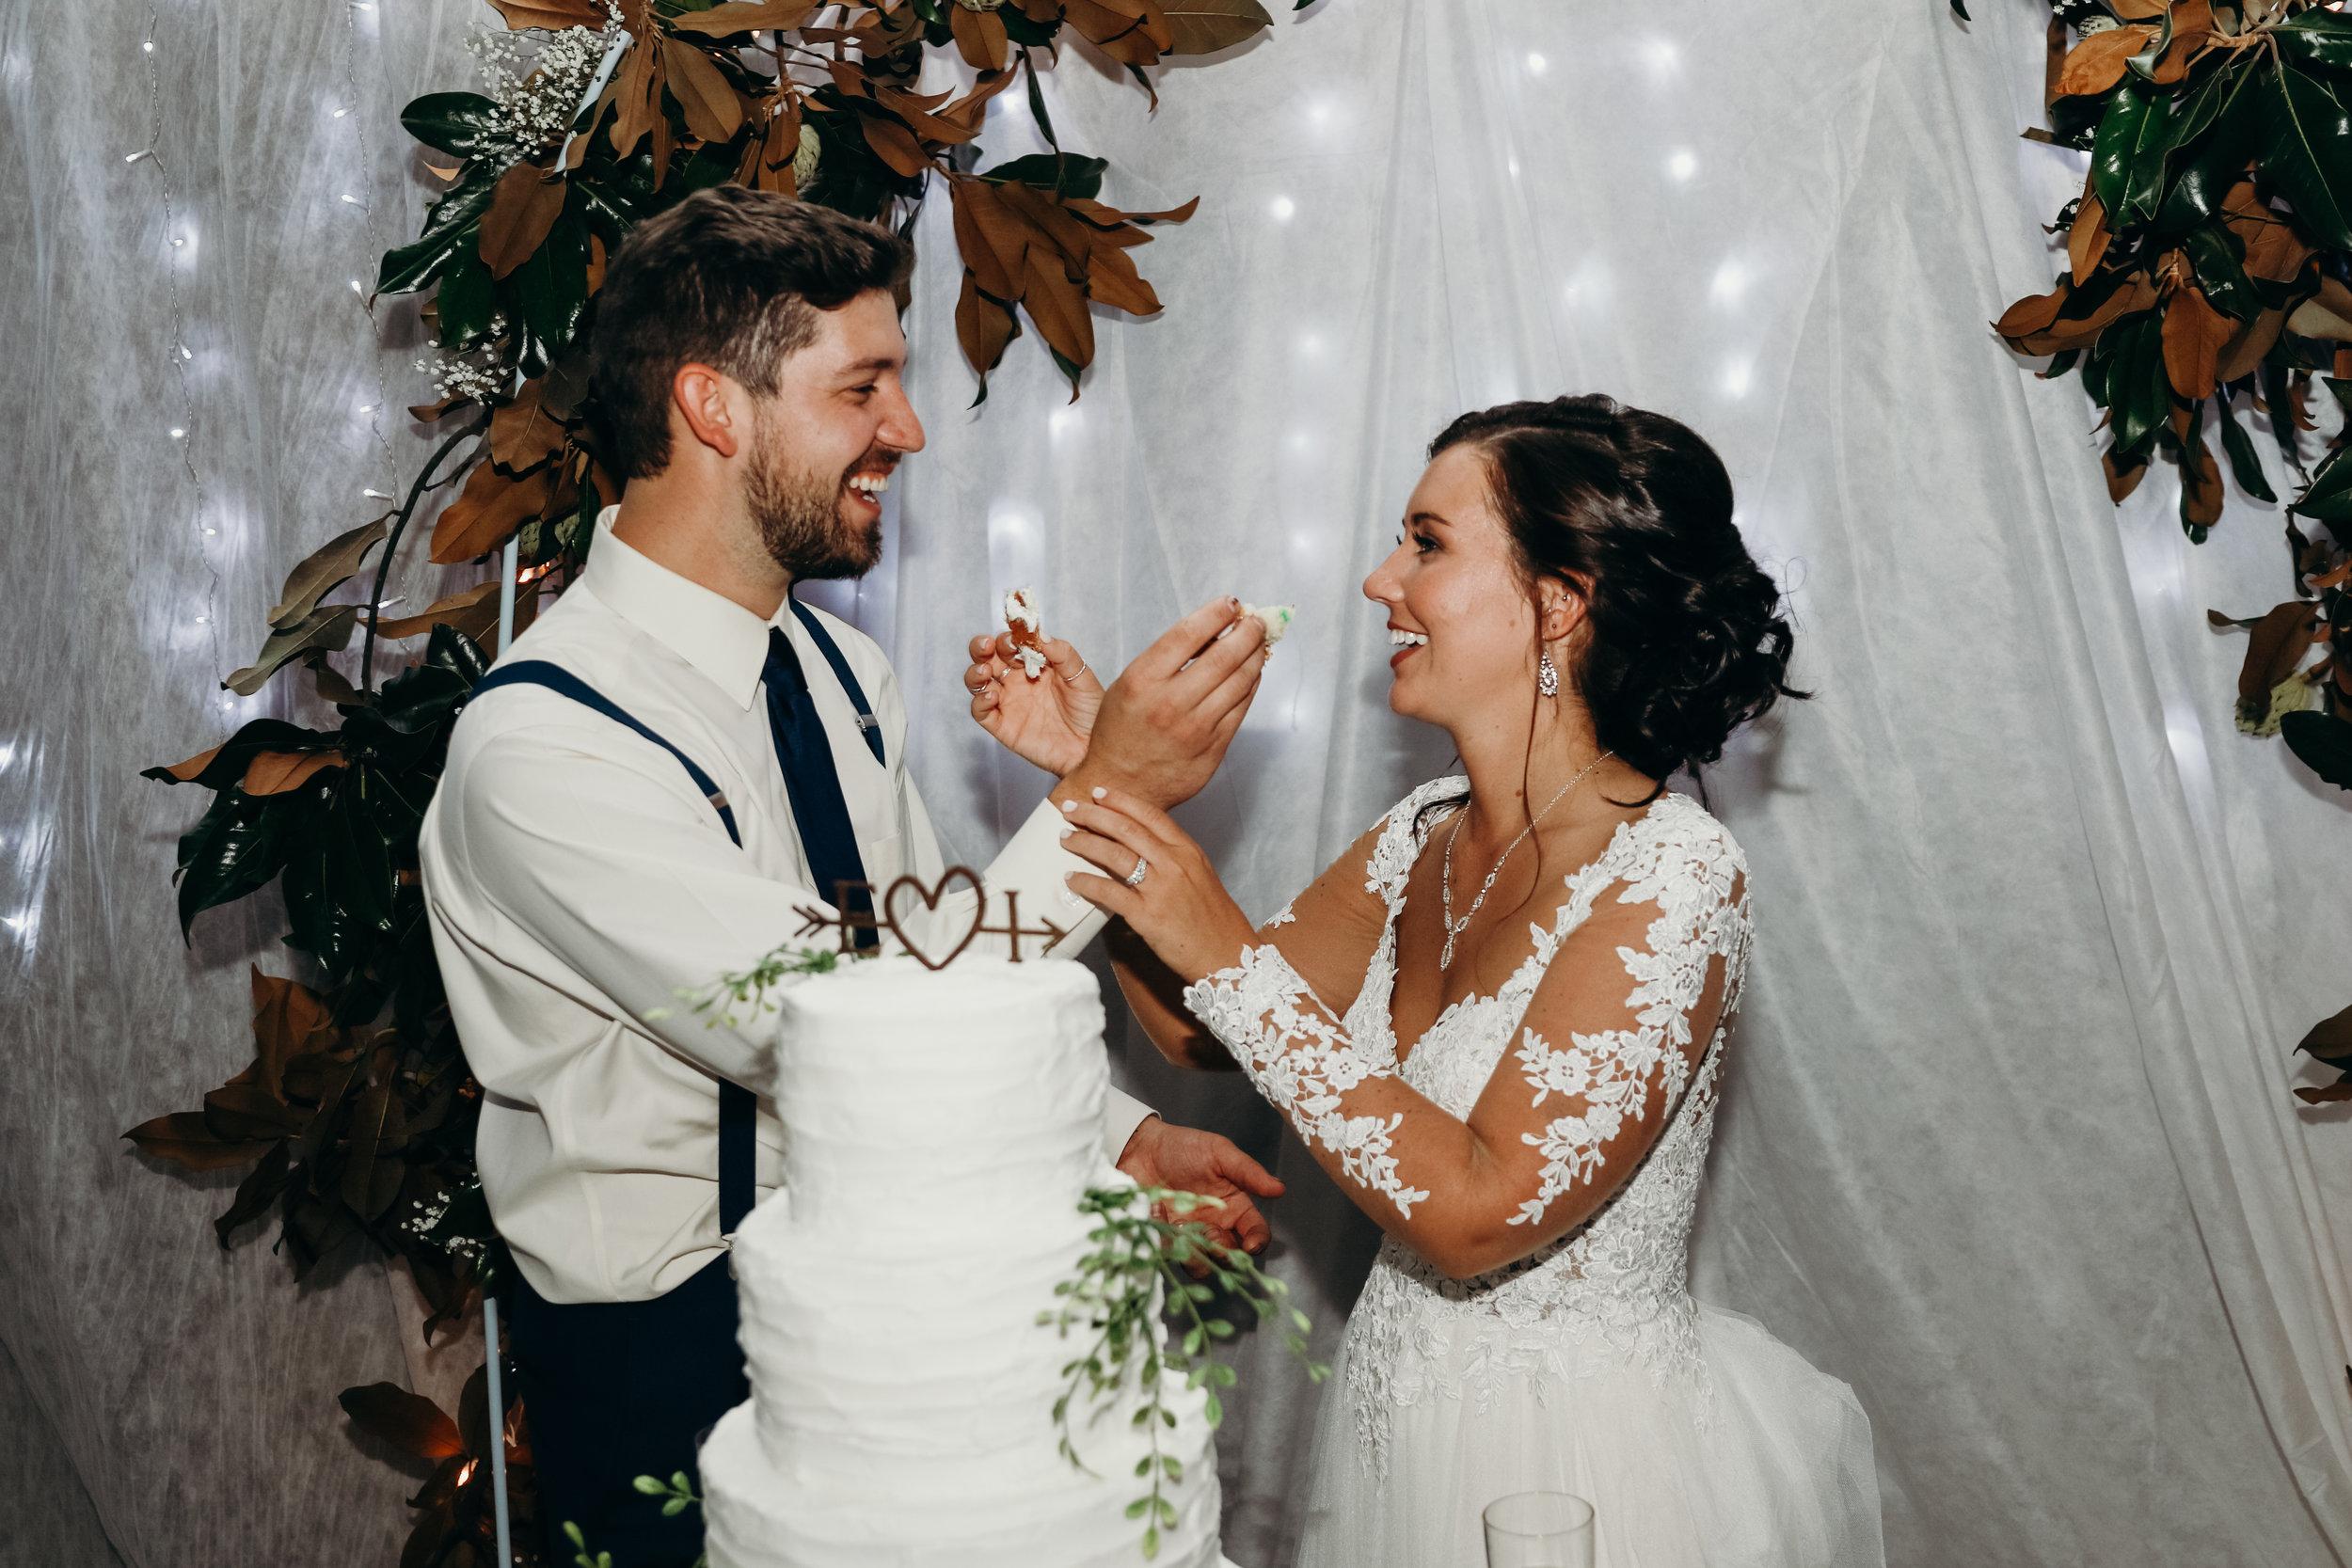 weddingday-33.jpg